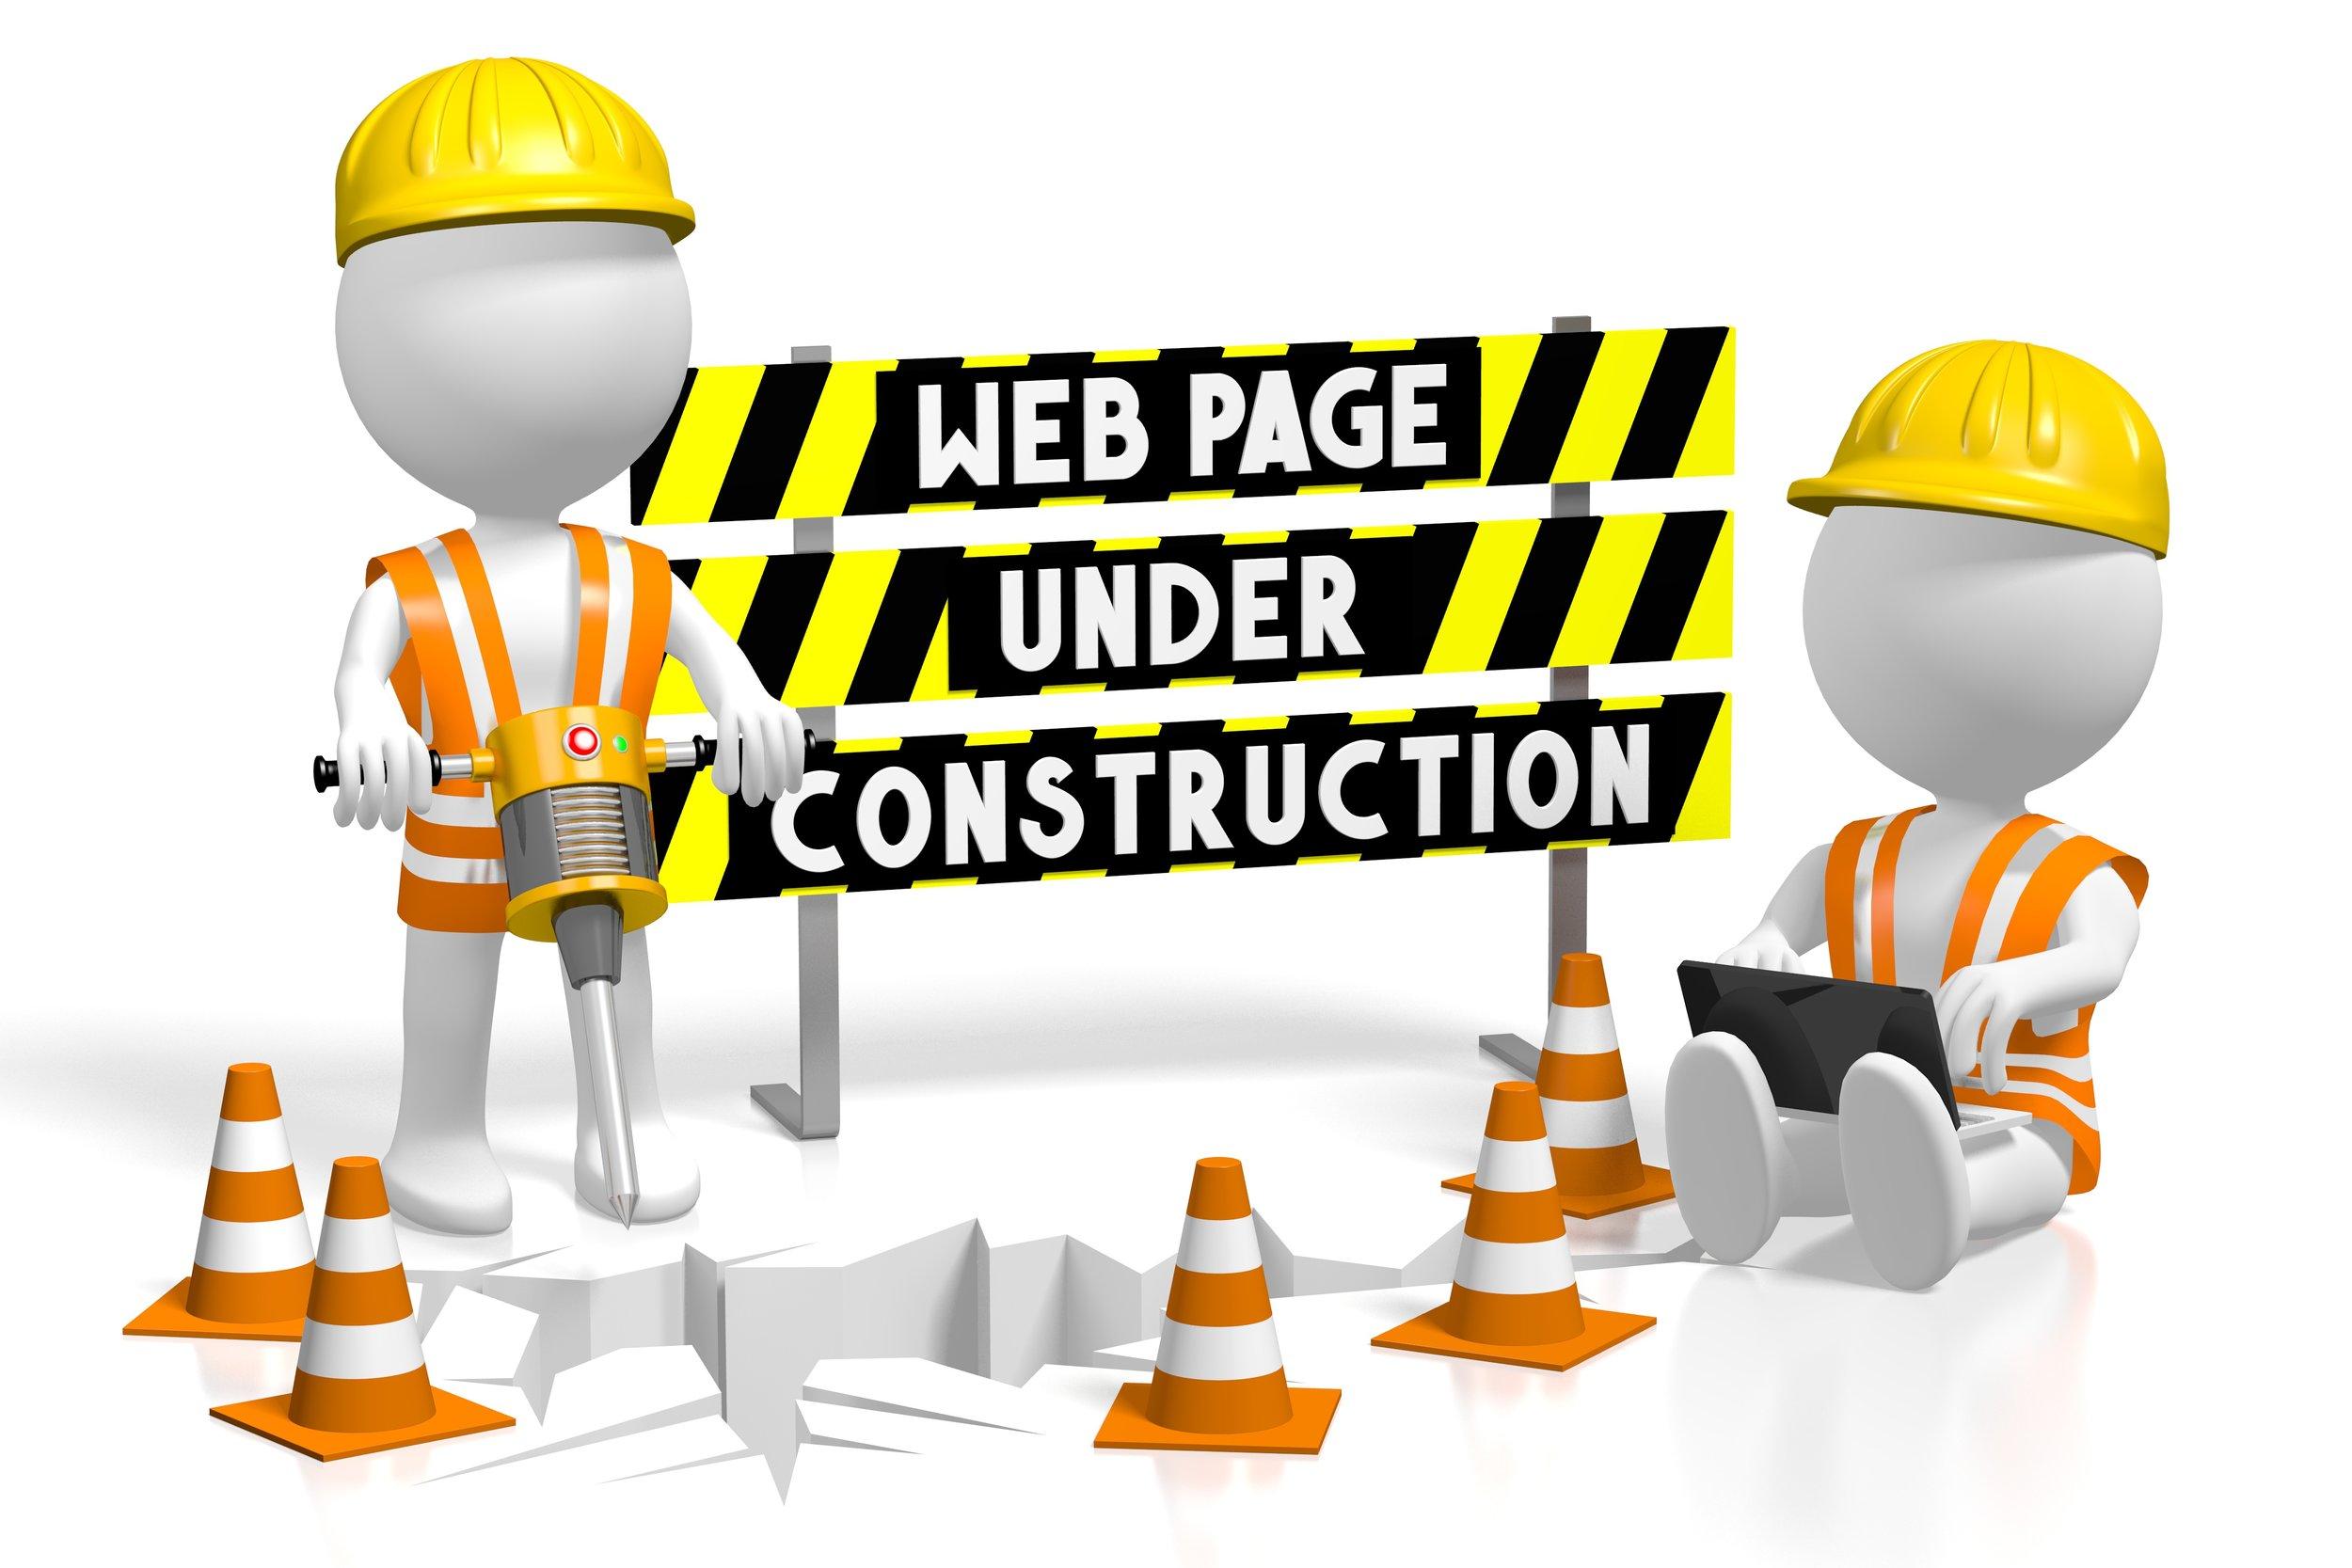 webPageConstruction.jpg